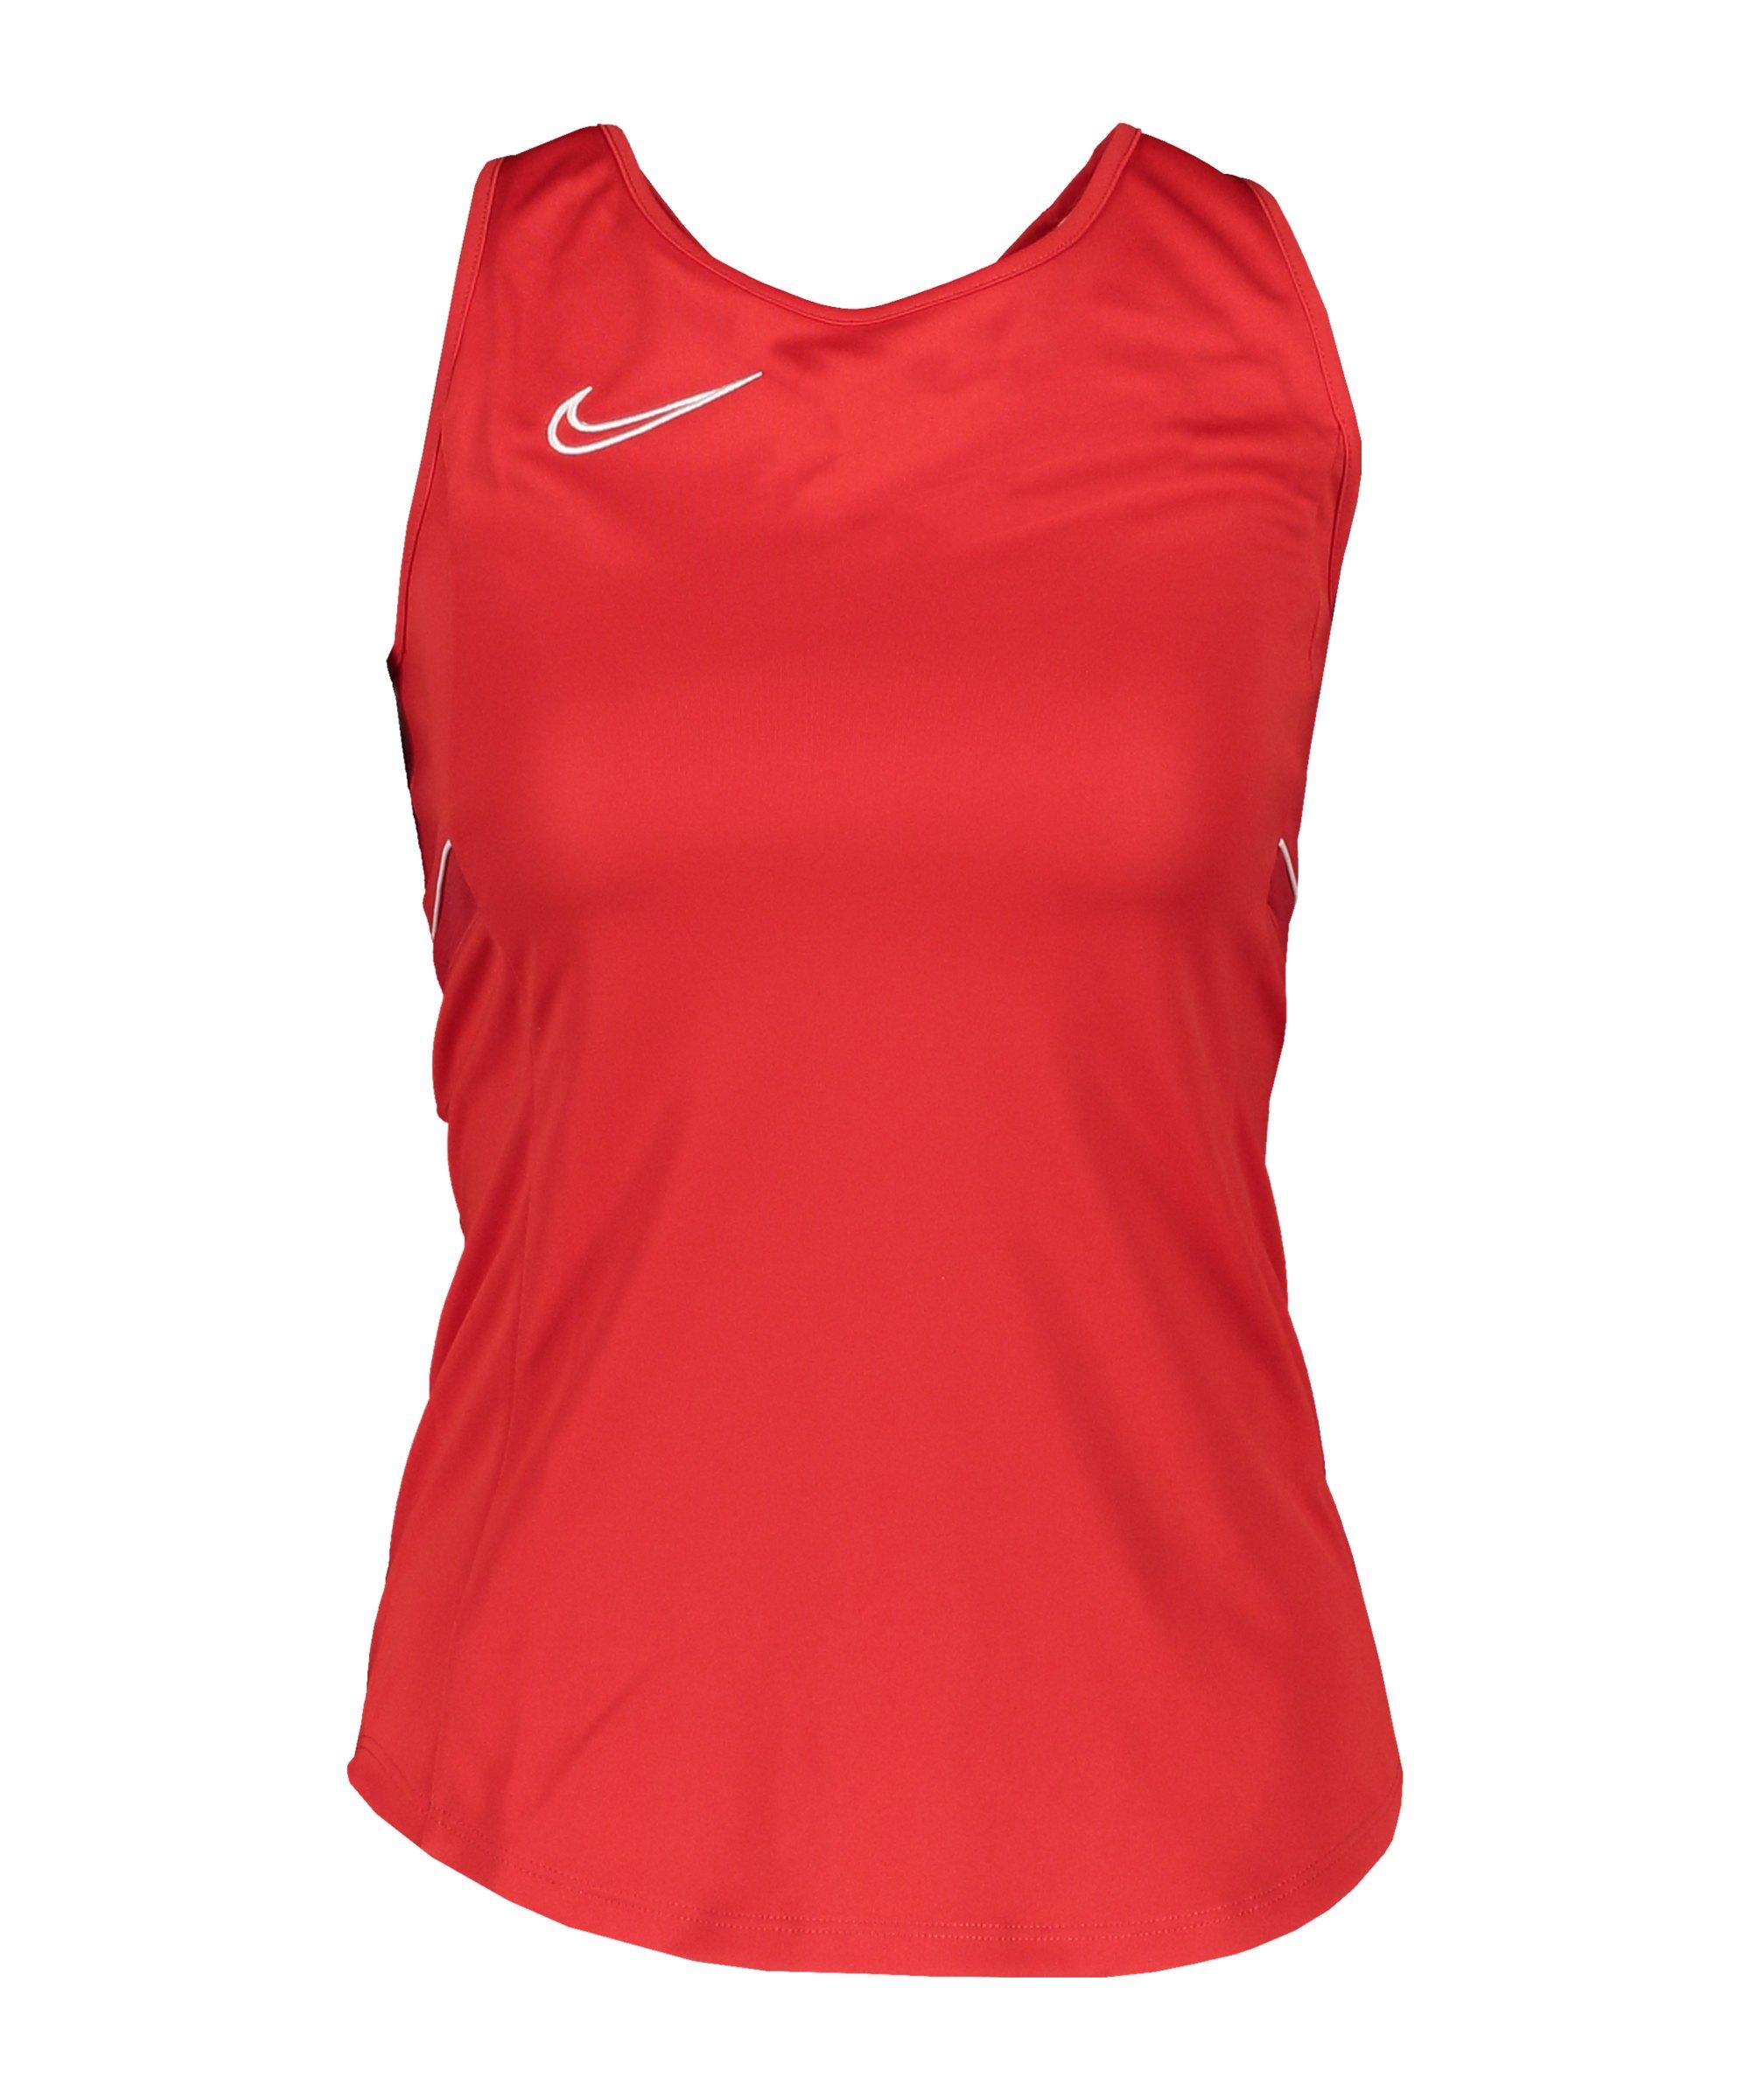 Nike Academy 21 Tanktop Damen Rot Weiss F657 - rot